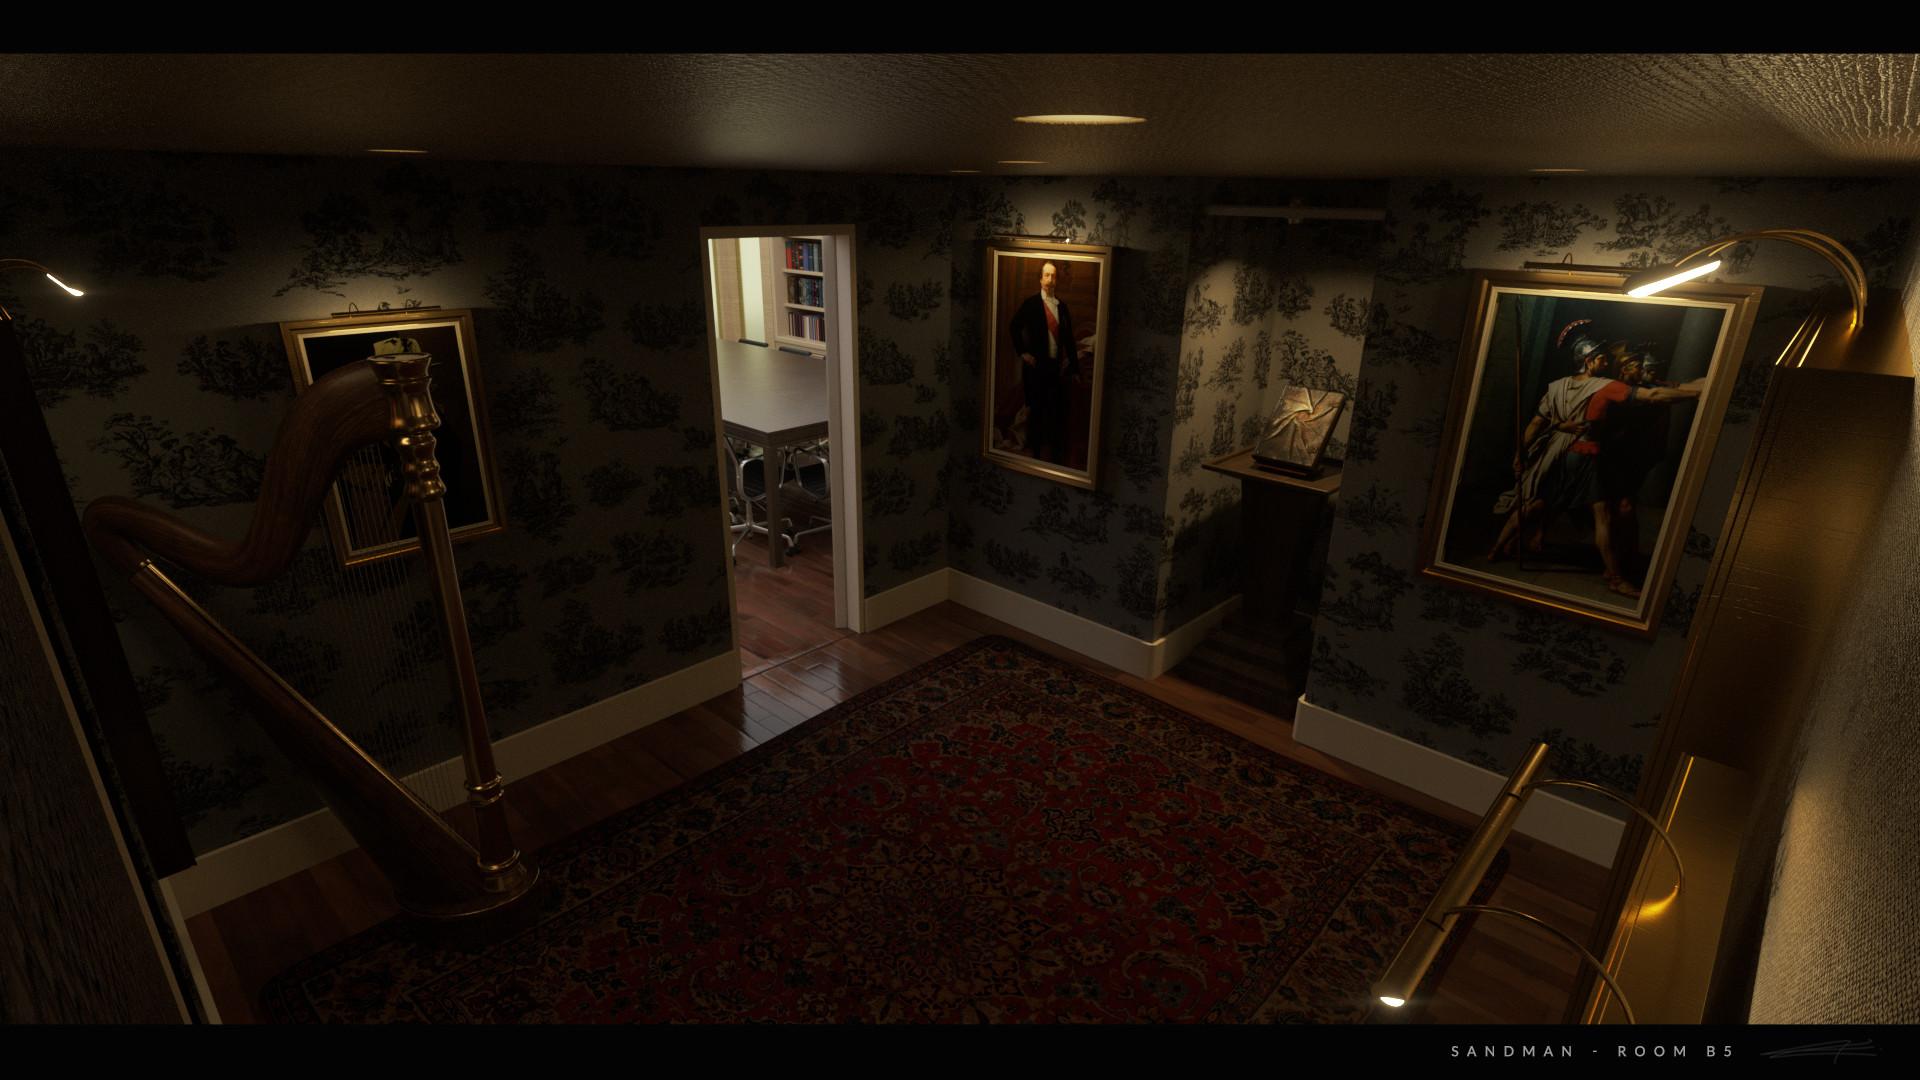 SM_Set_Room_B5_v1.jpg